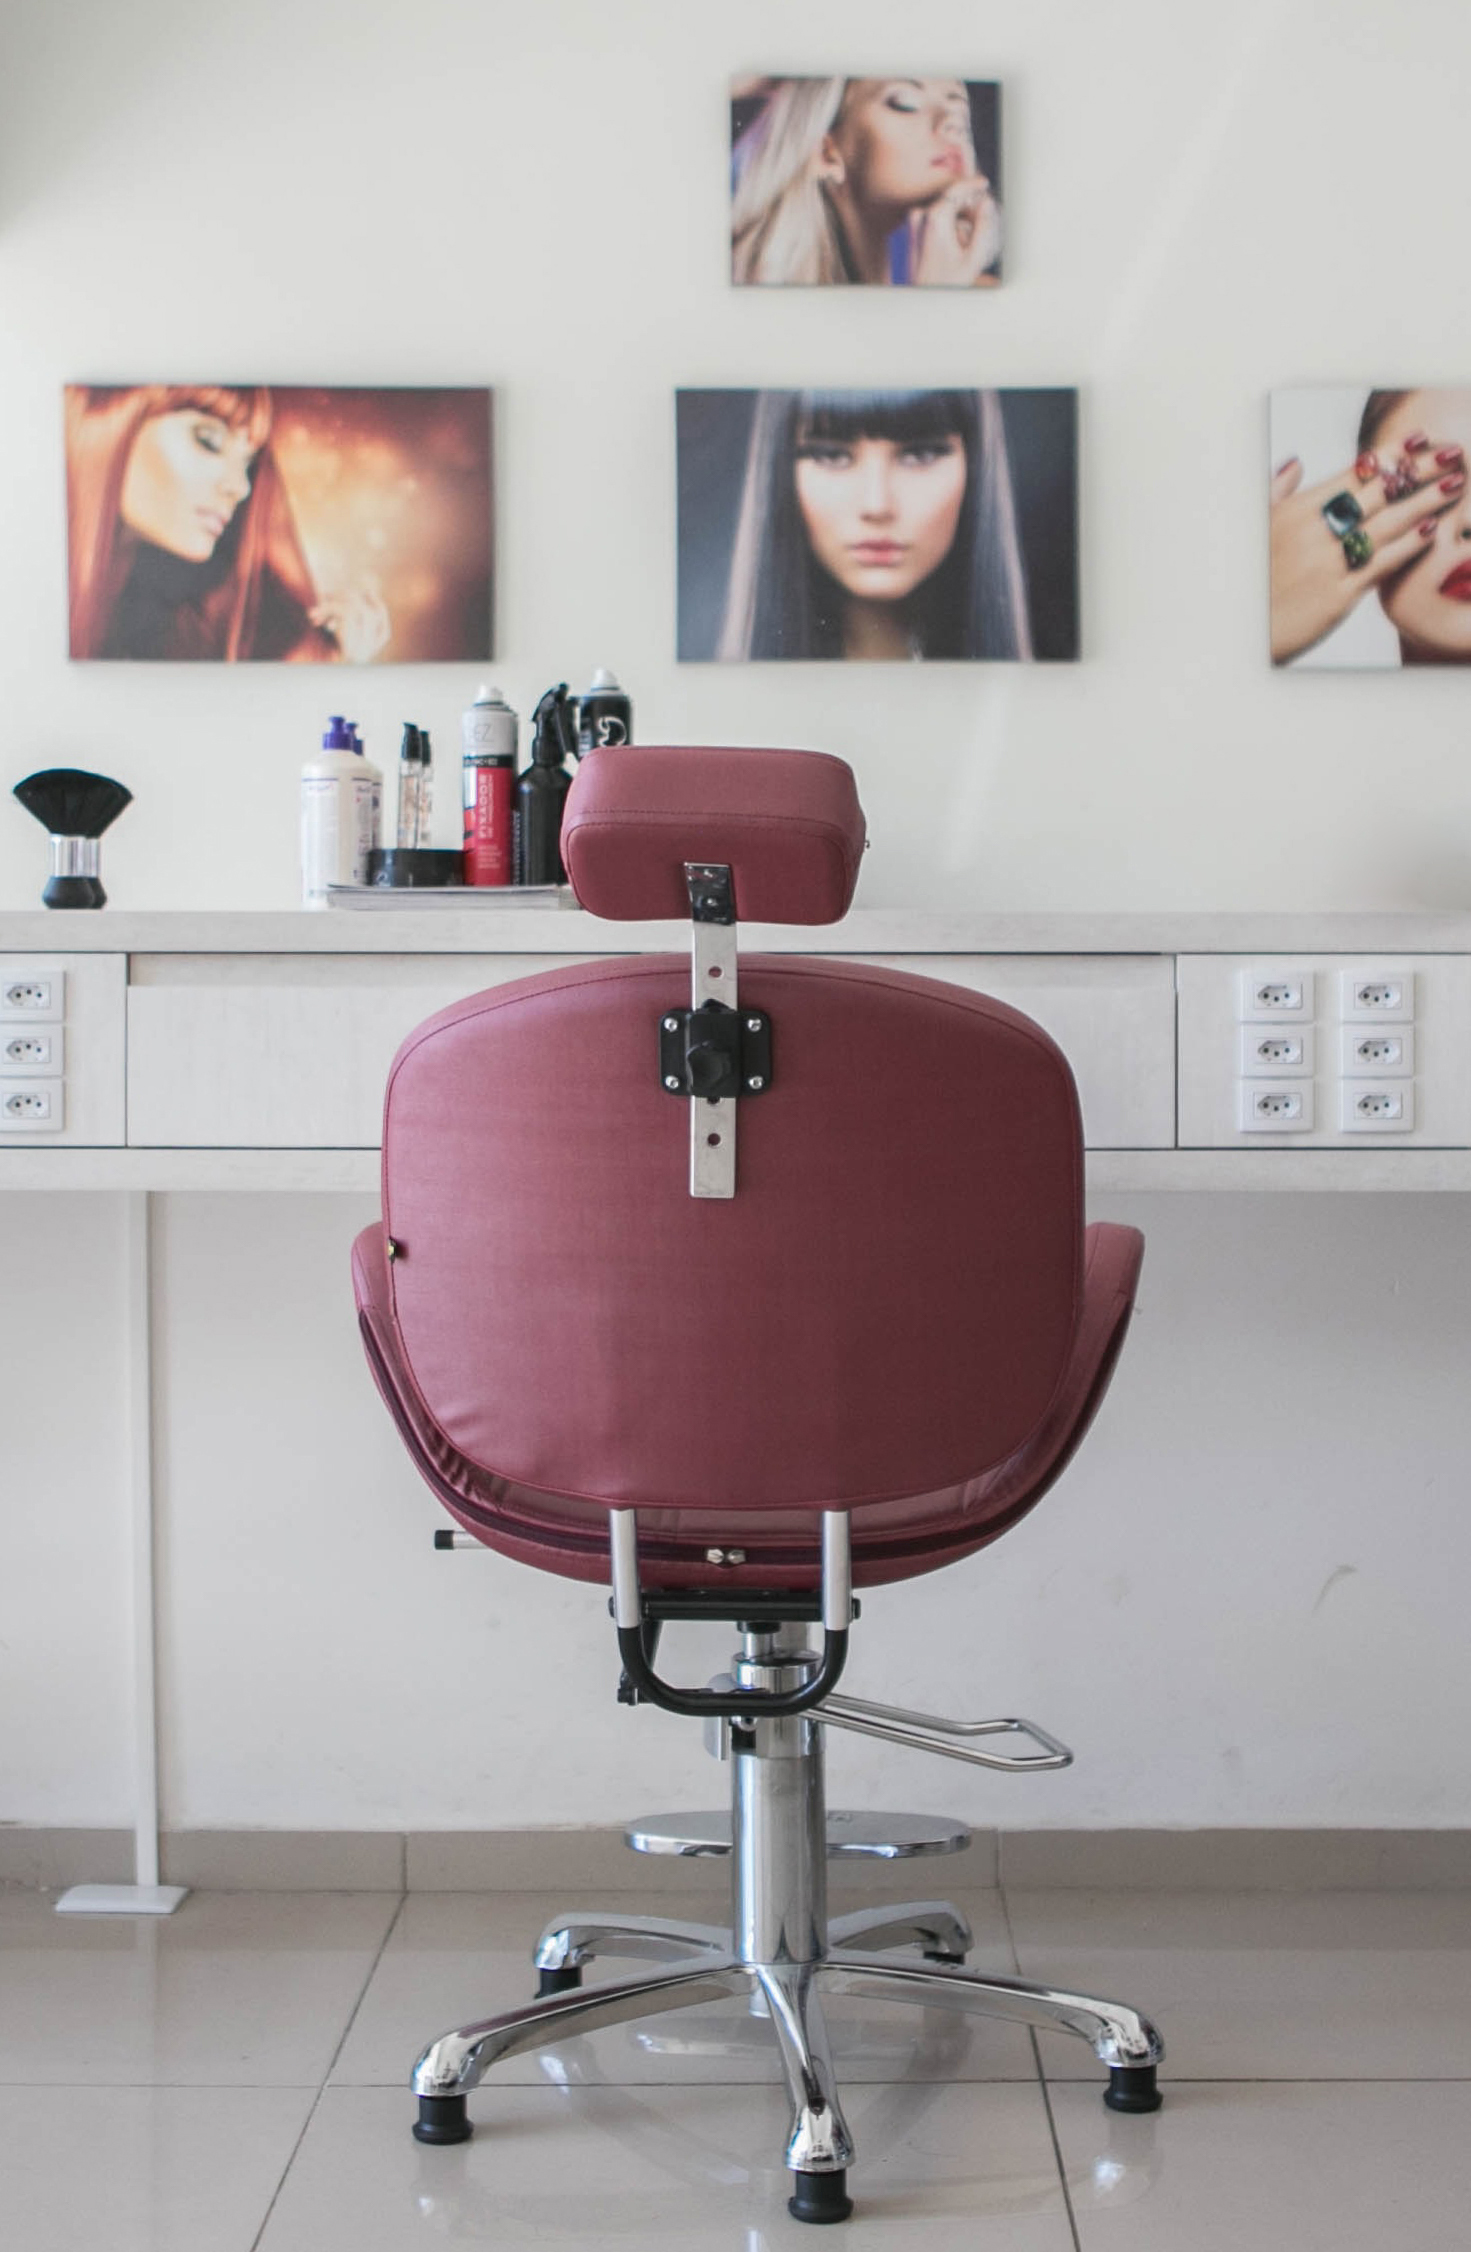 Australian-Salons, Salon-Industry, Hairdressing-Industry